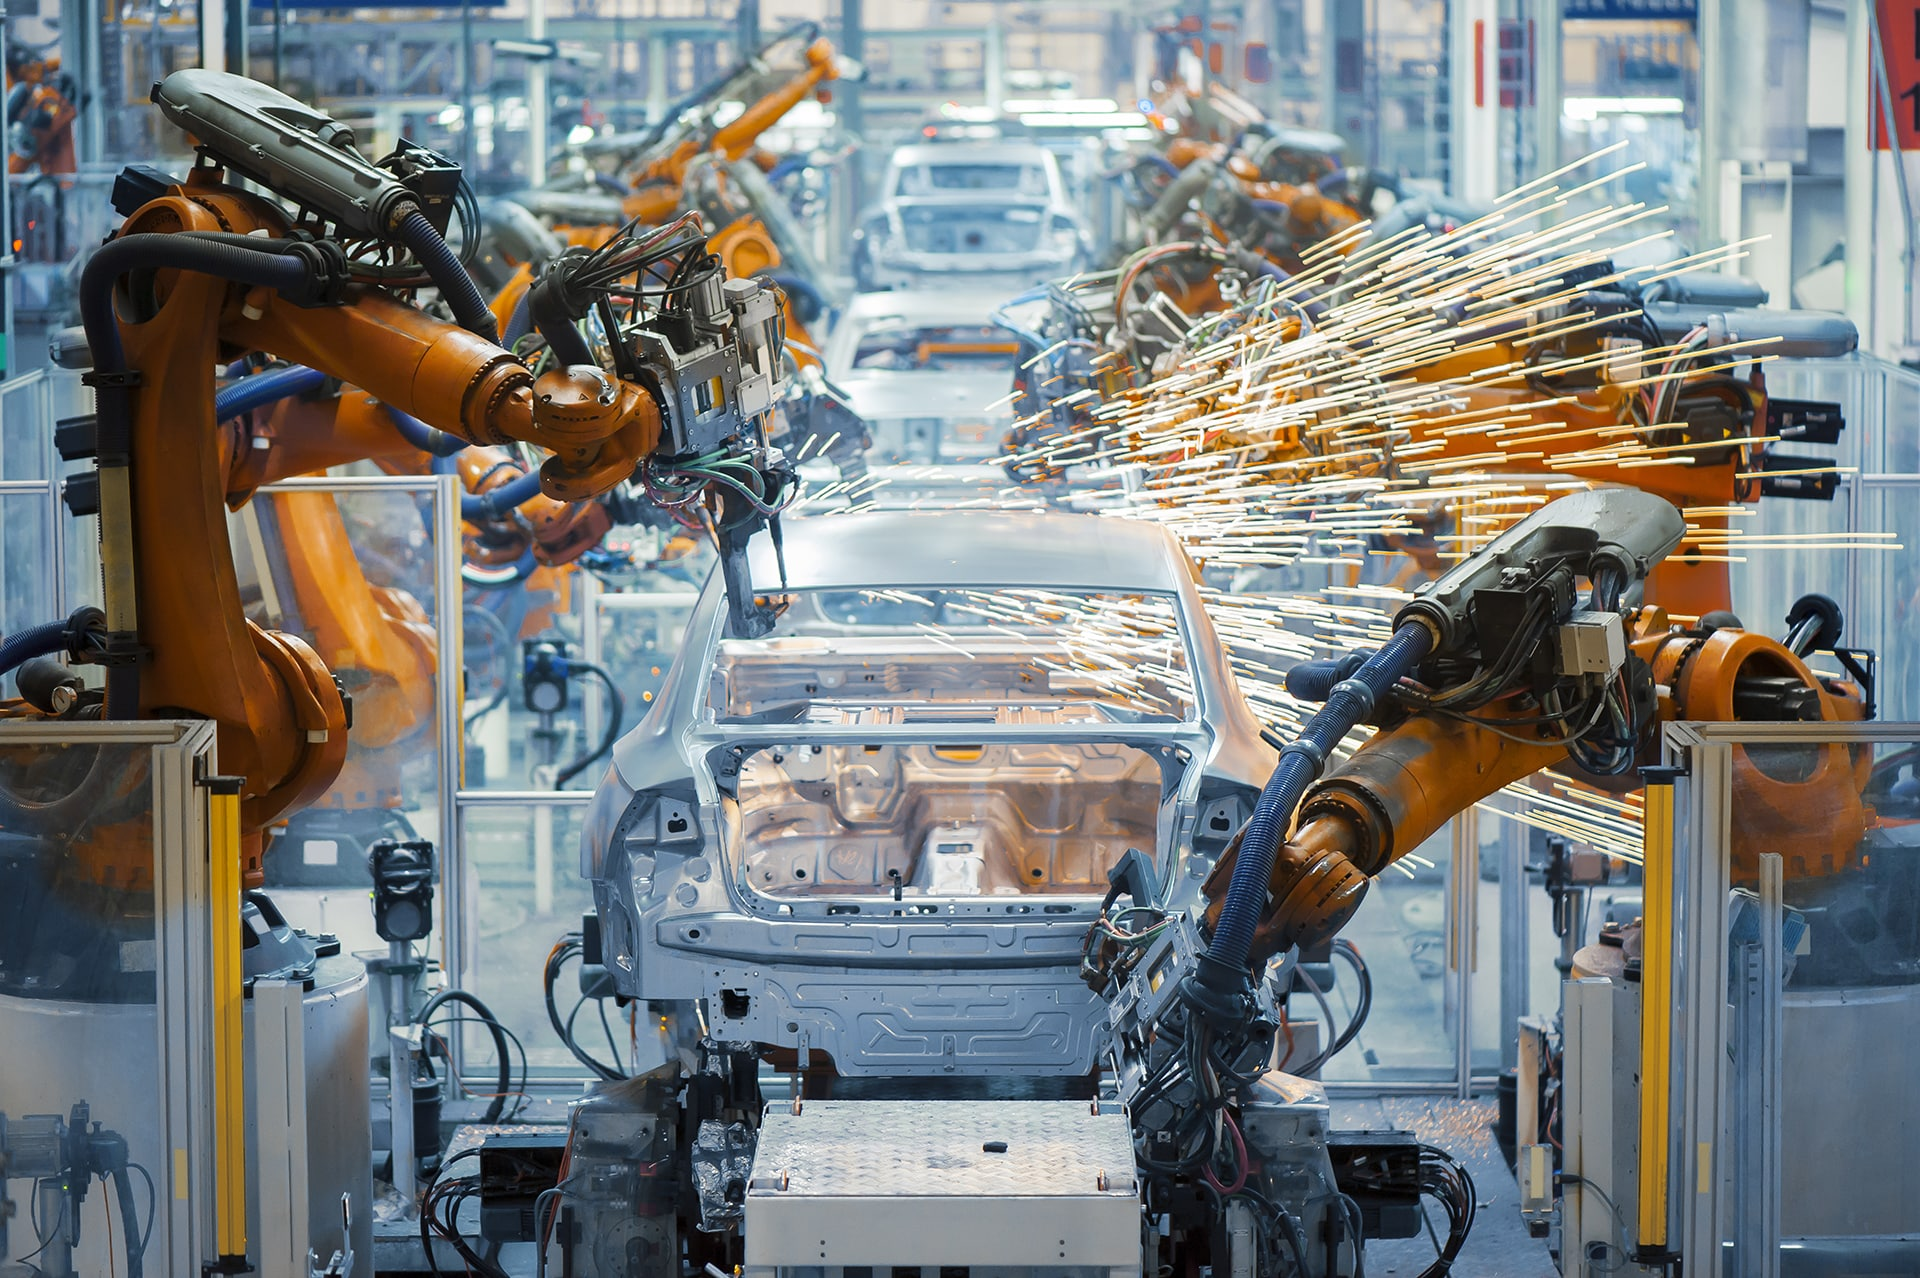 Sistemi di chiusura per industrie